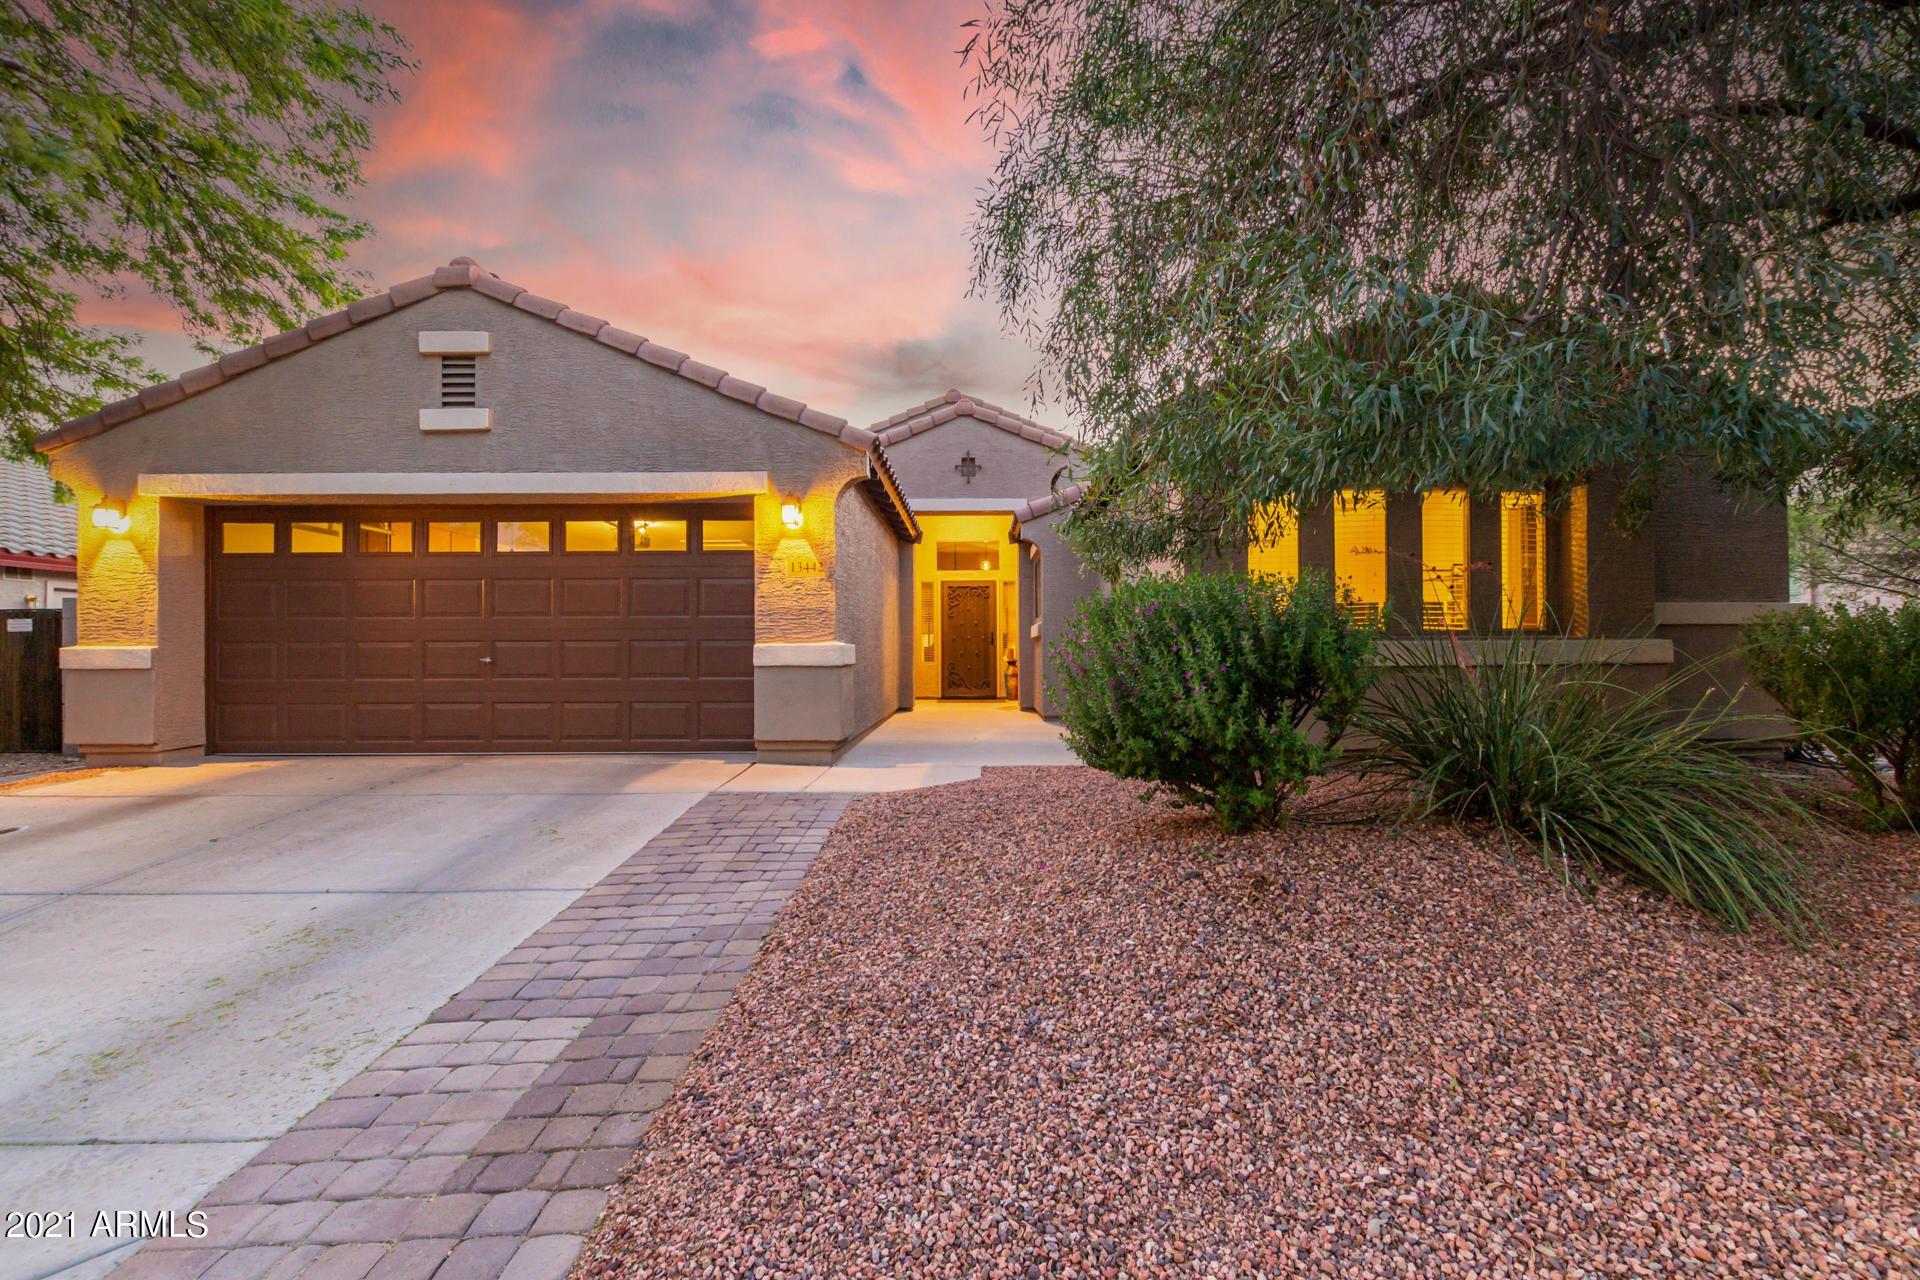 Photo of 13442 N 177TH Drive, Surprise, AZ 85388 (MLS # 6272292)